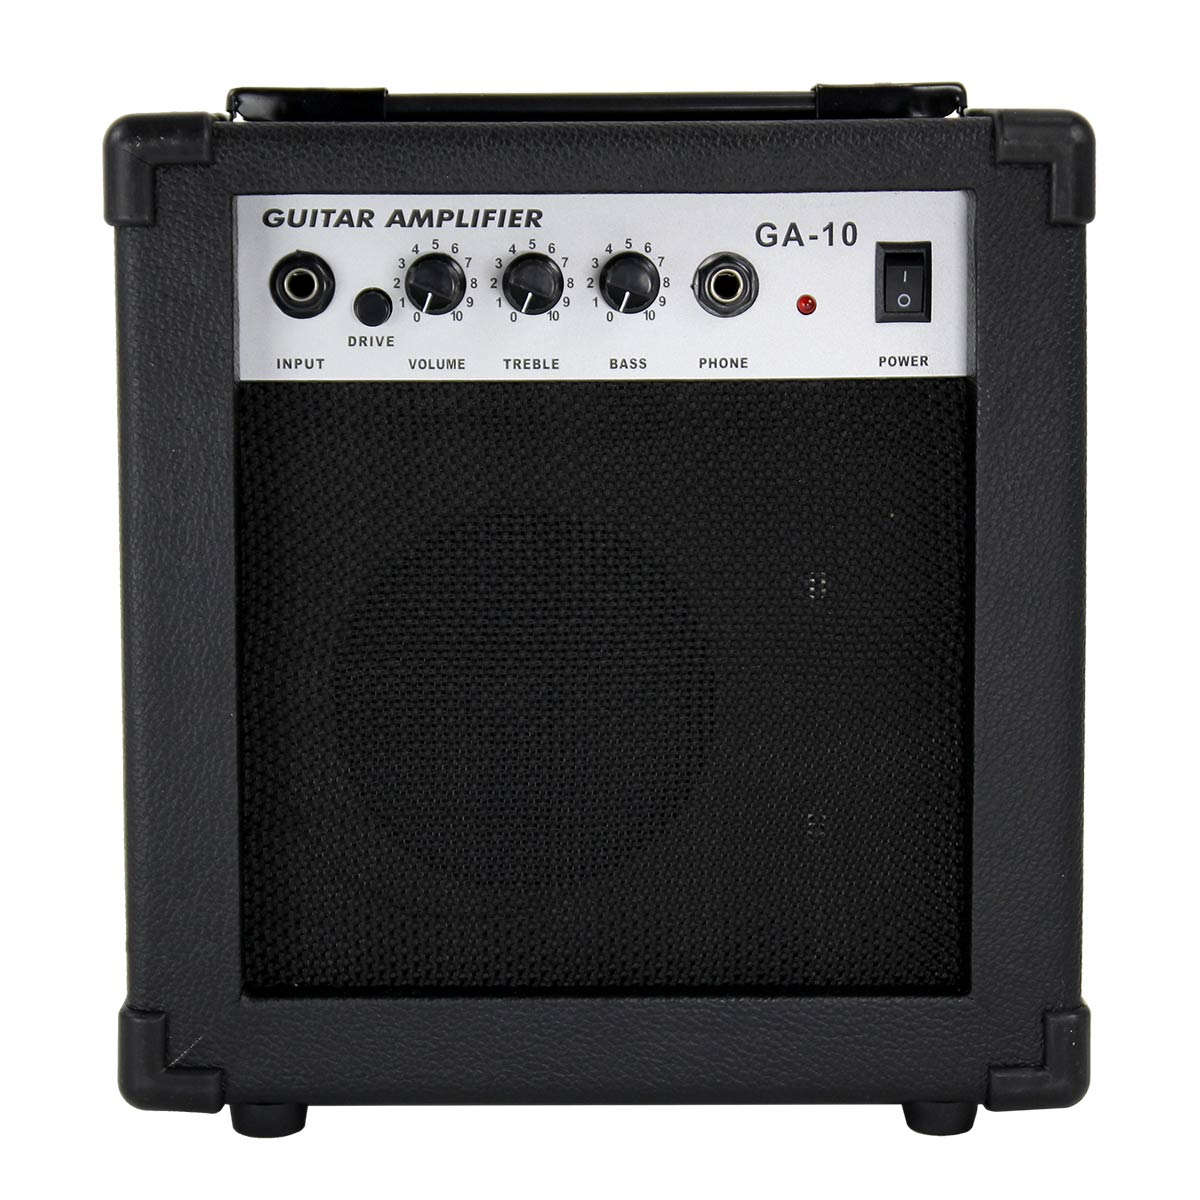 gearlux electric guitar practice amp. Black Bedroom Furniture Sets. Home Design Ideas